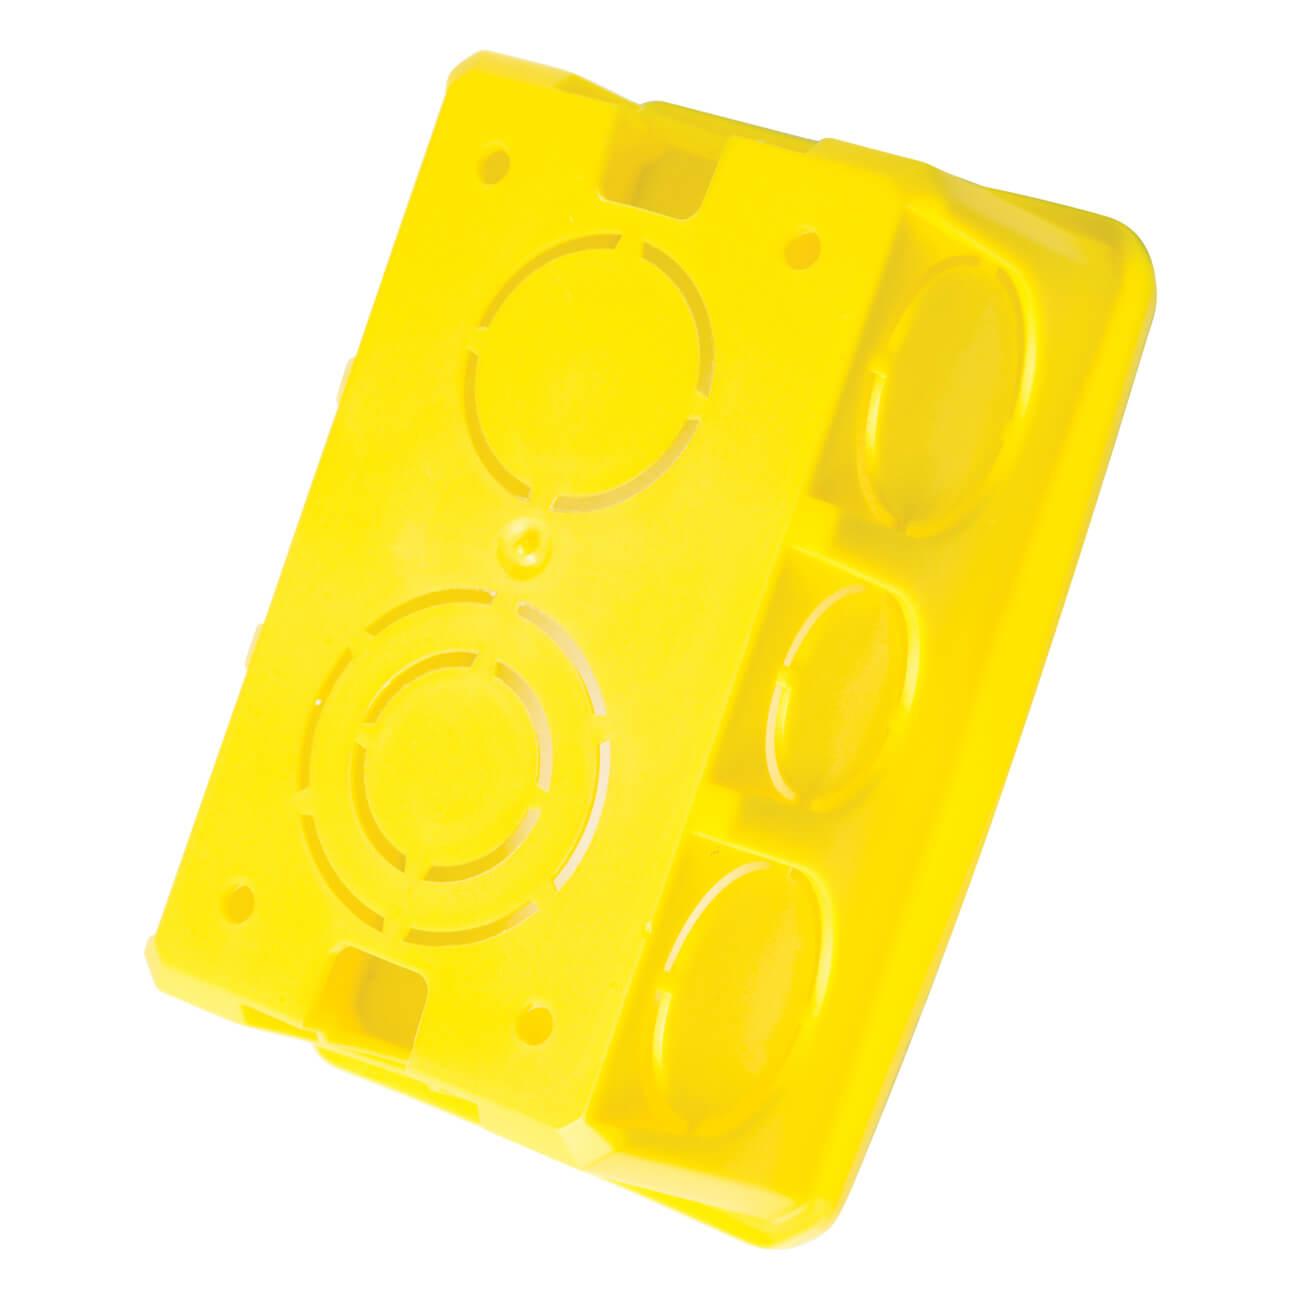 Caixa de Luz 4x2 PVC Amarela - Tramontina